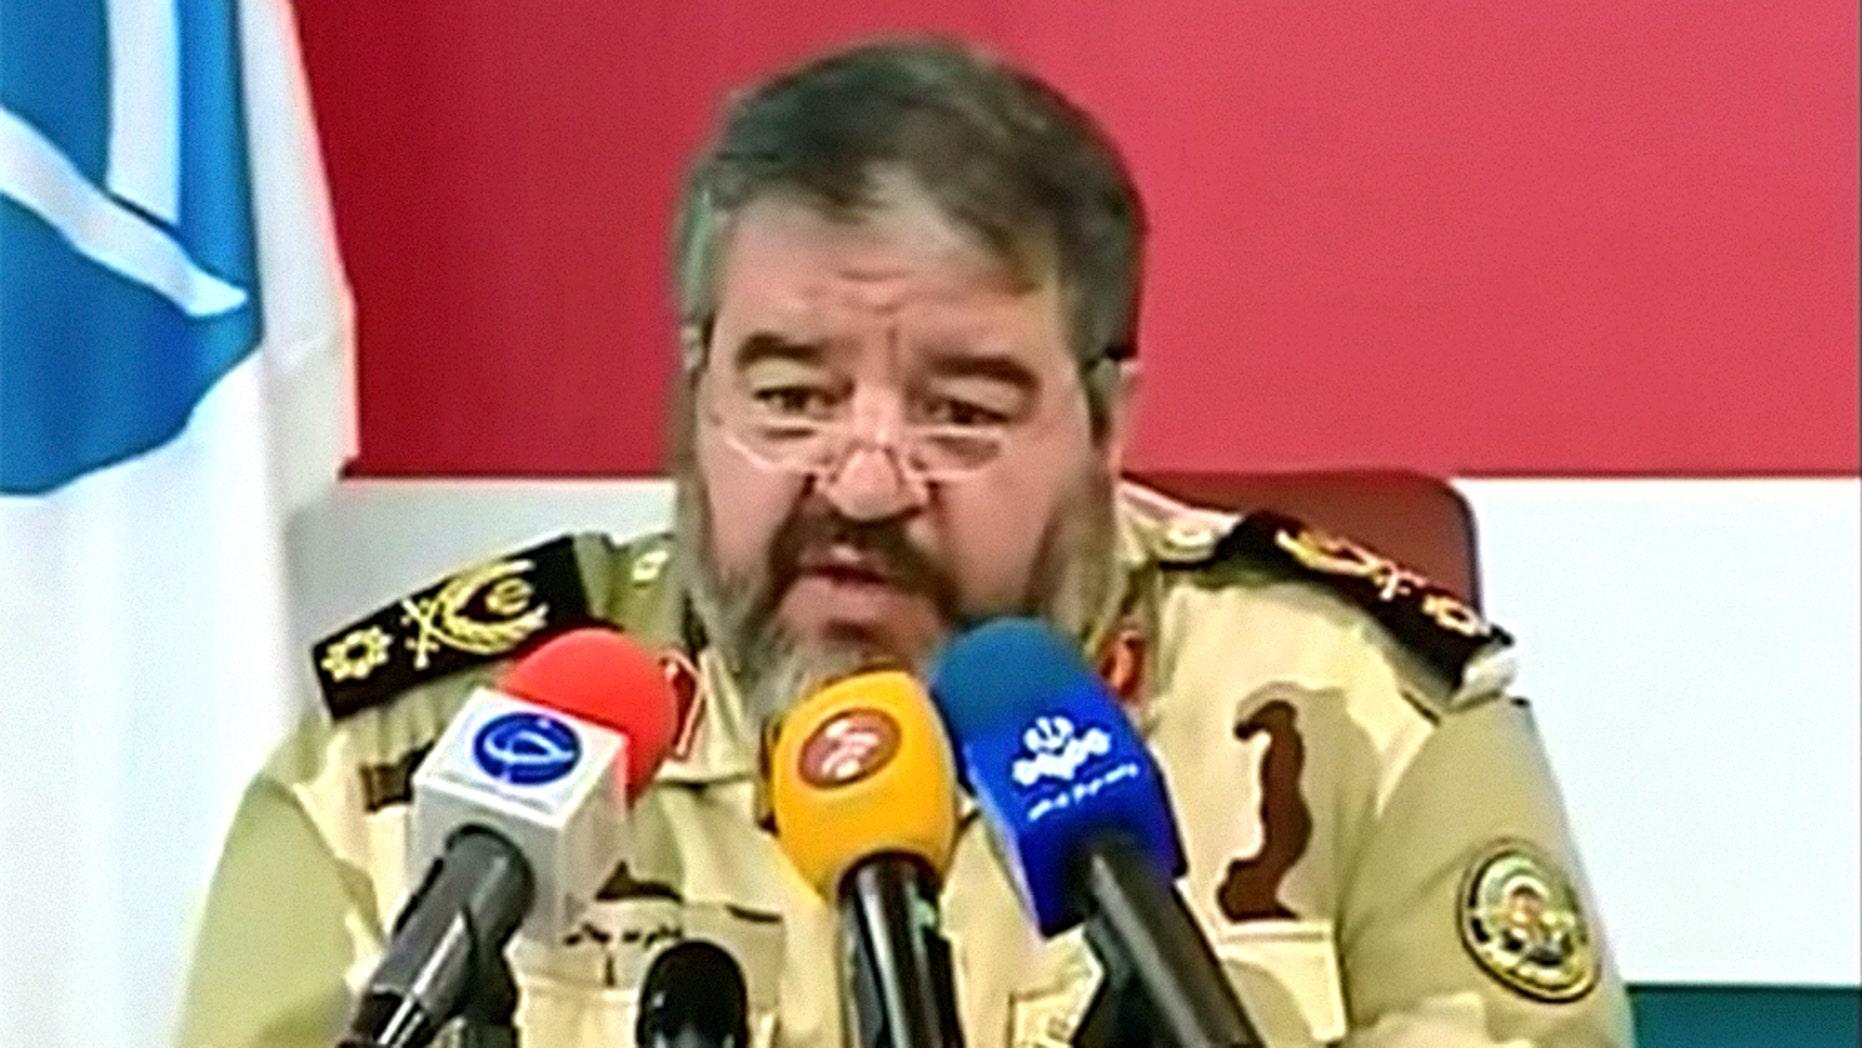 Brigadier General Gholam Reza Jalali accused Israel of manipulating weather over Iran.